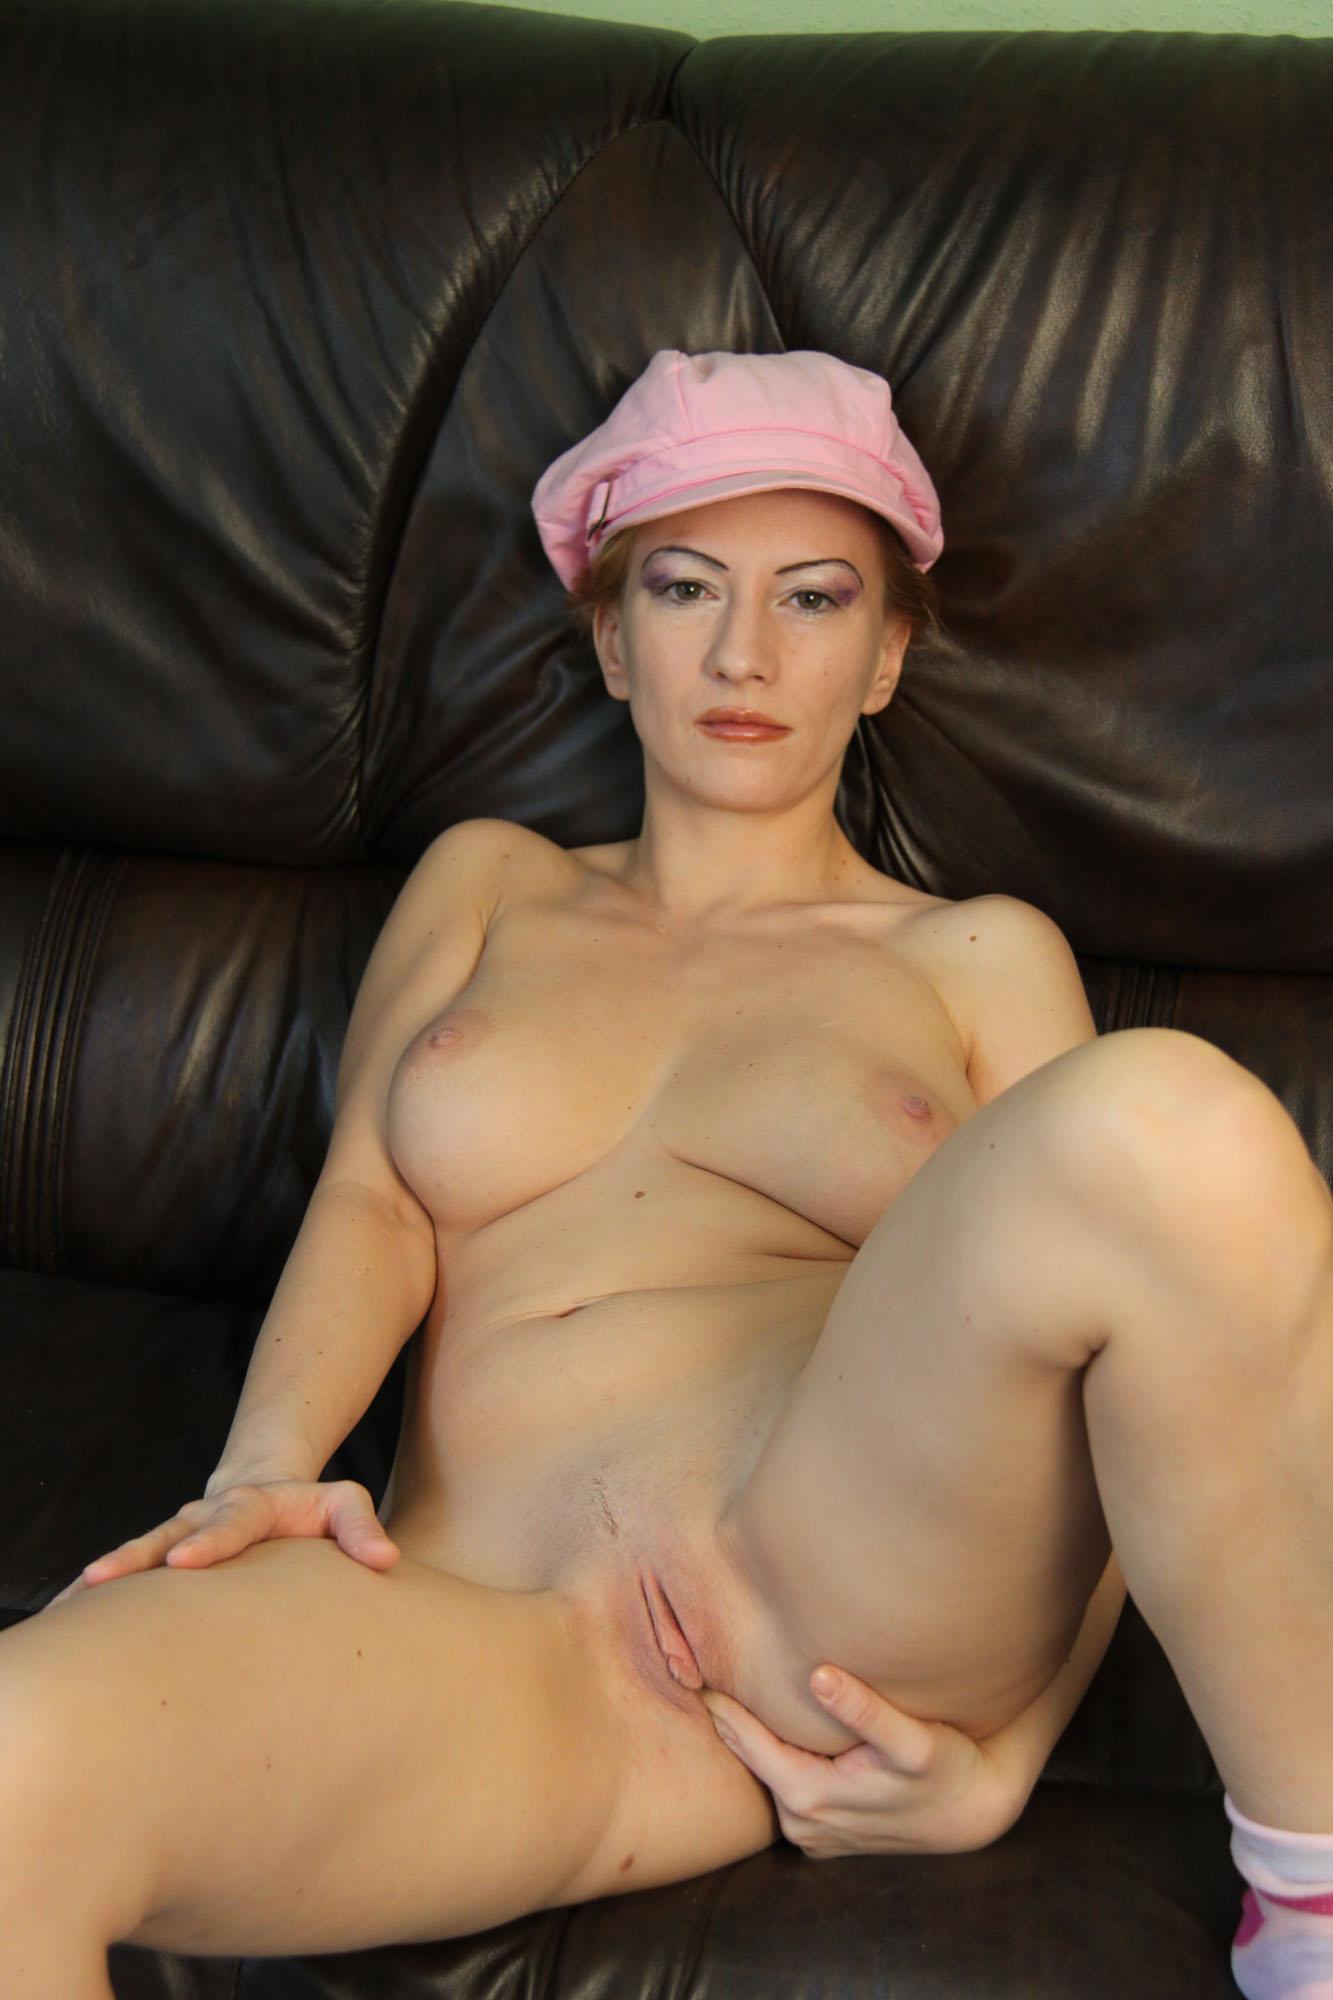 purzelvideos true beauty filomena masturbating slut nude